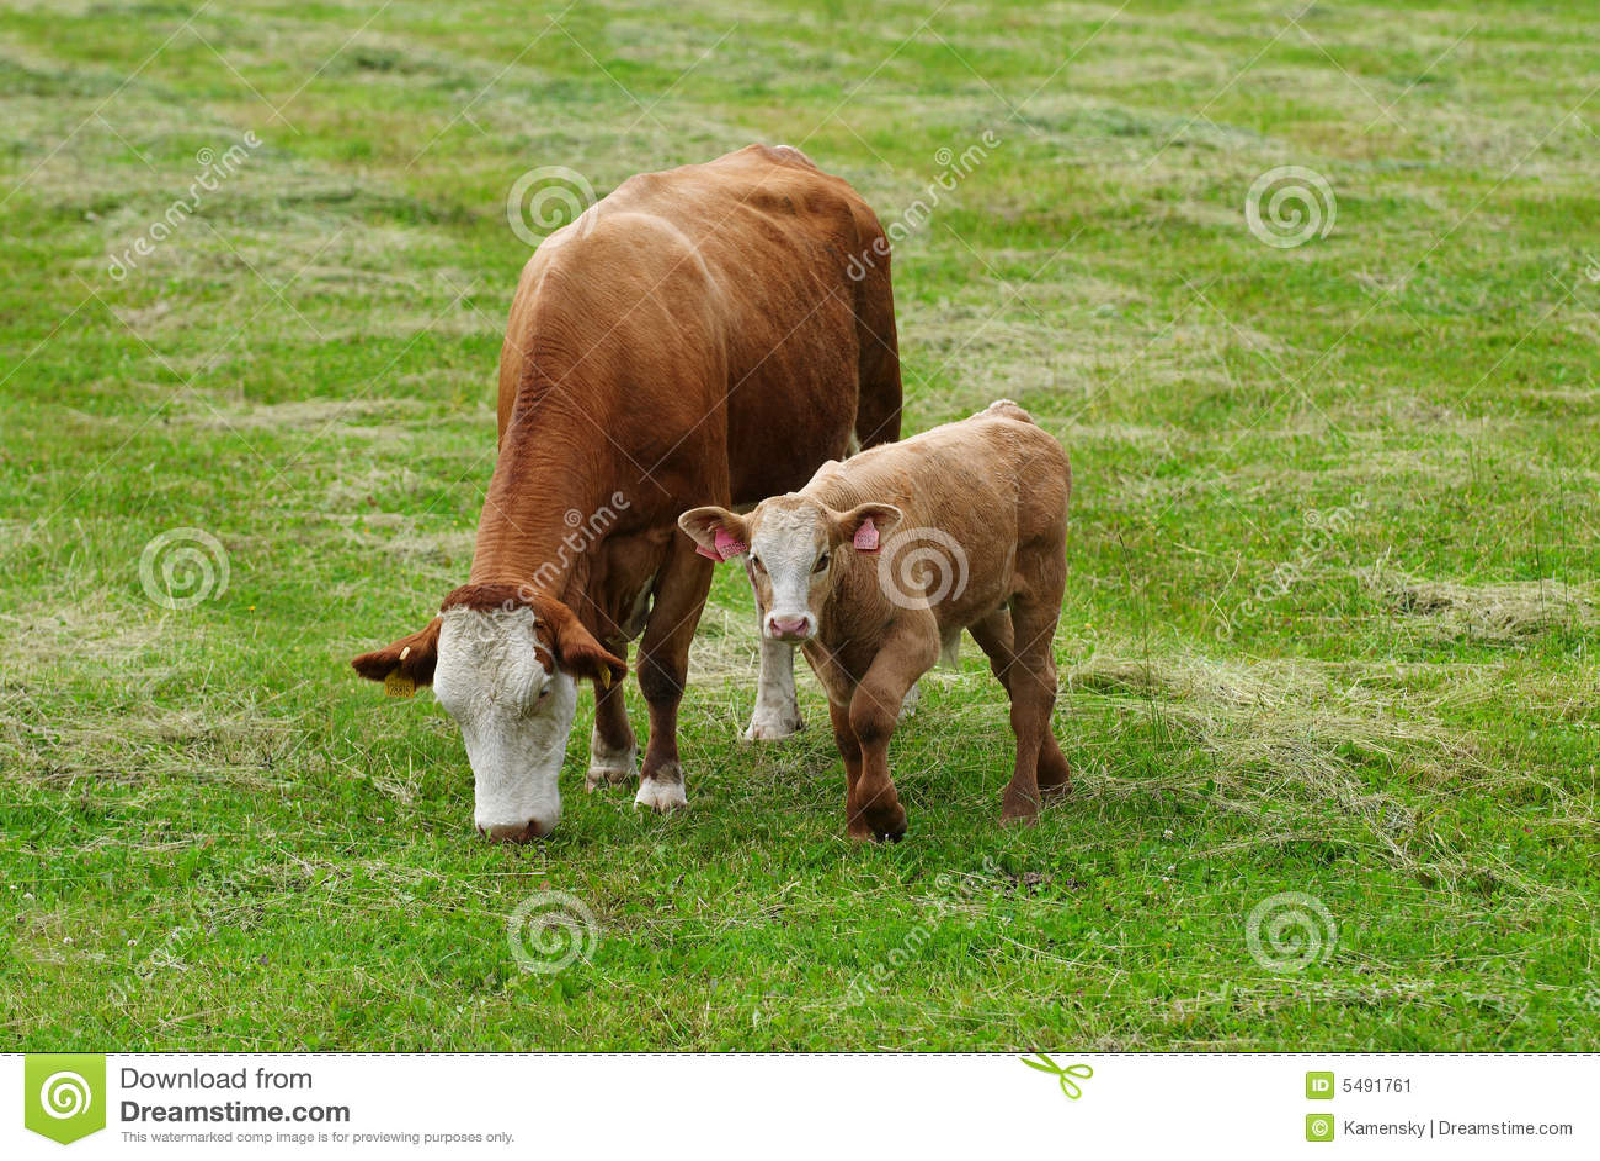 секс фото у коровы.